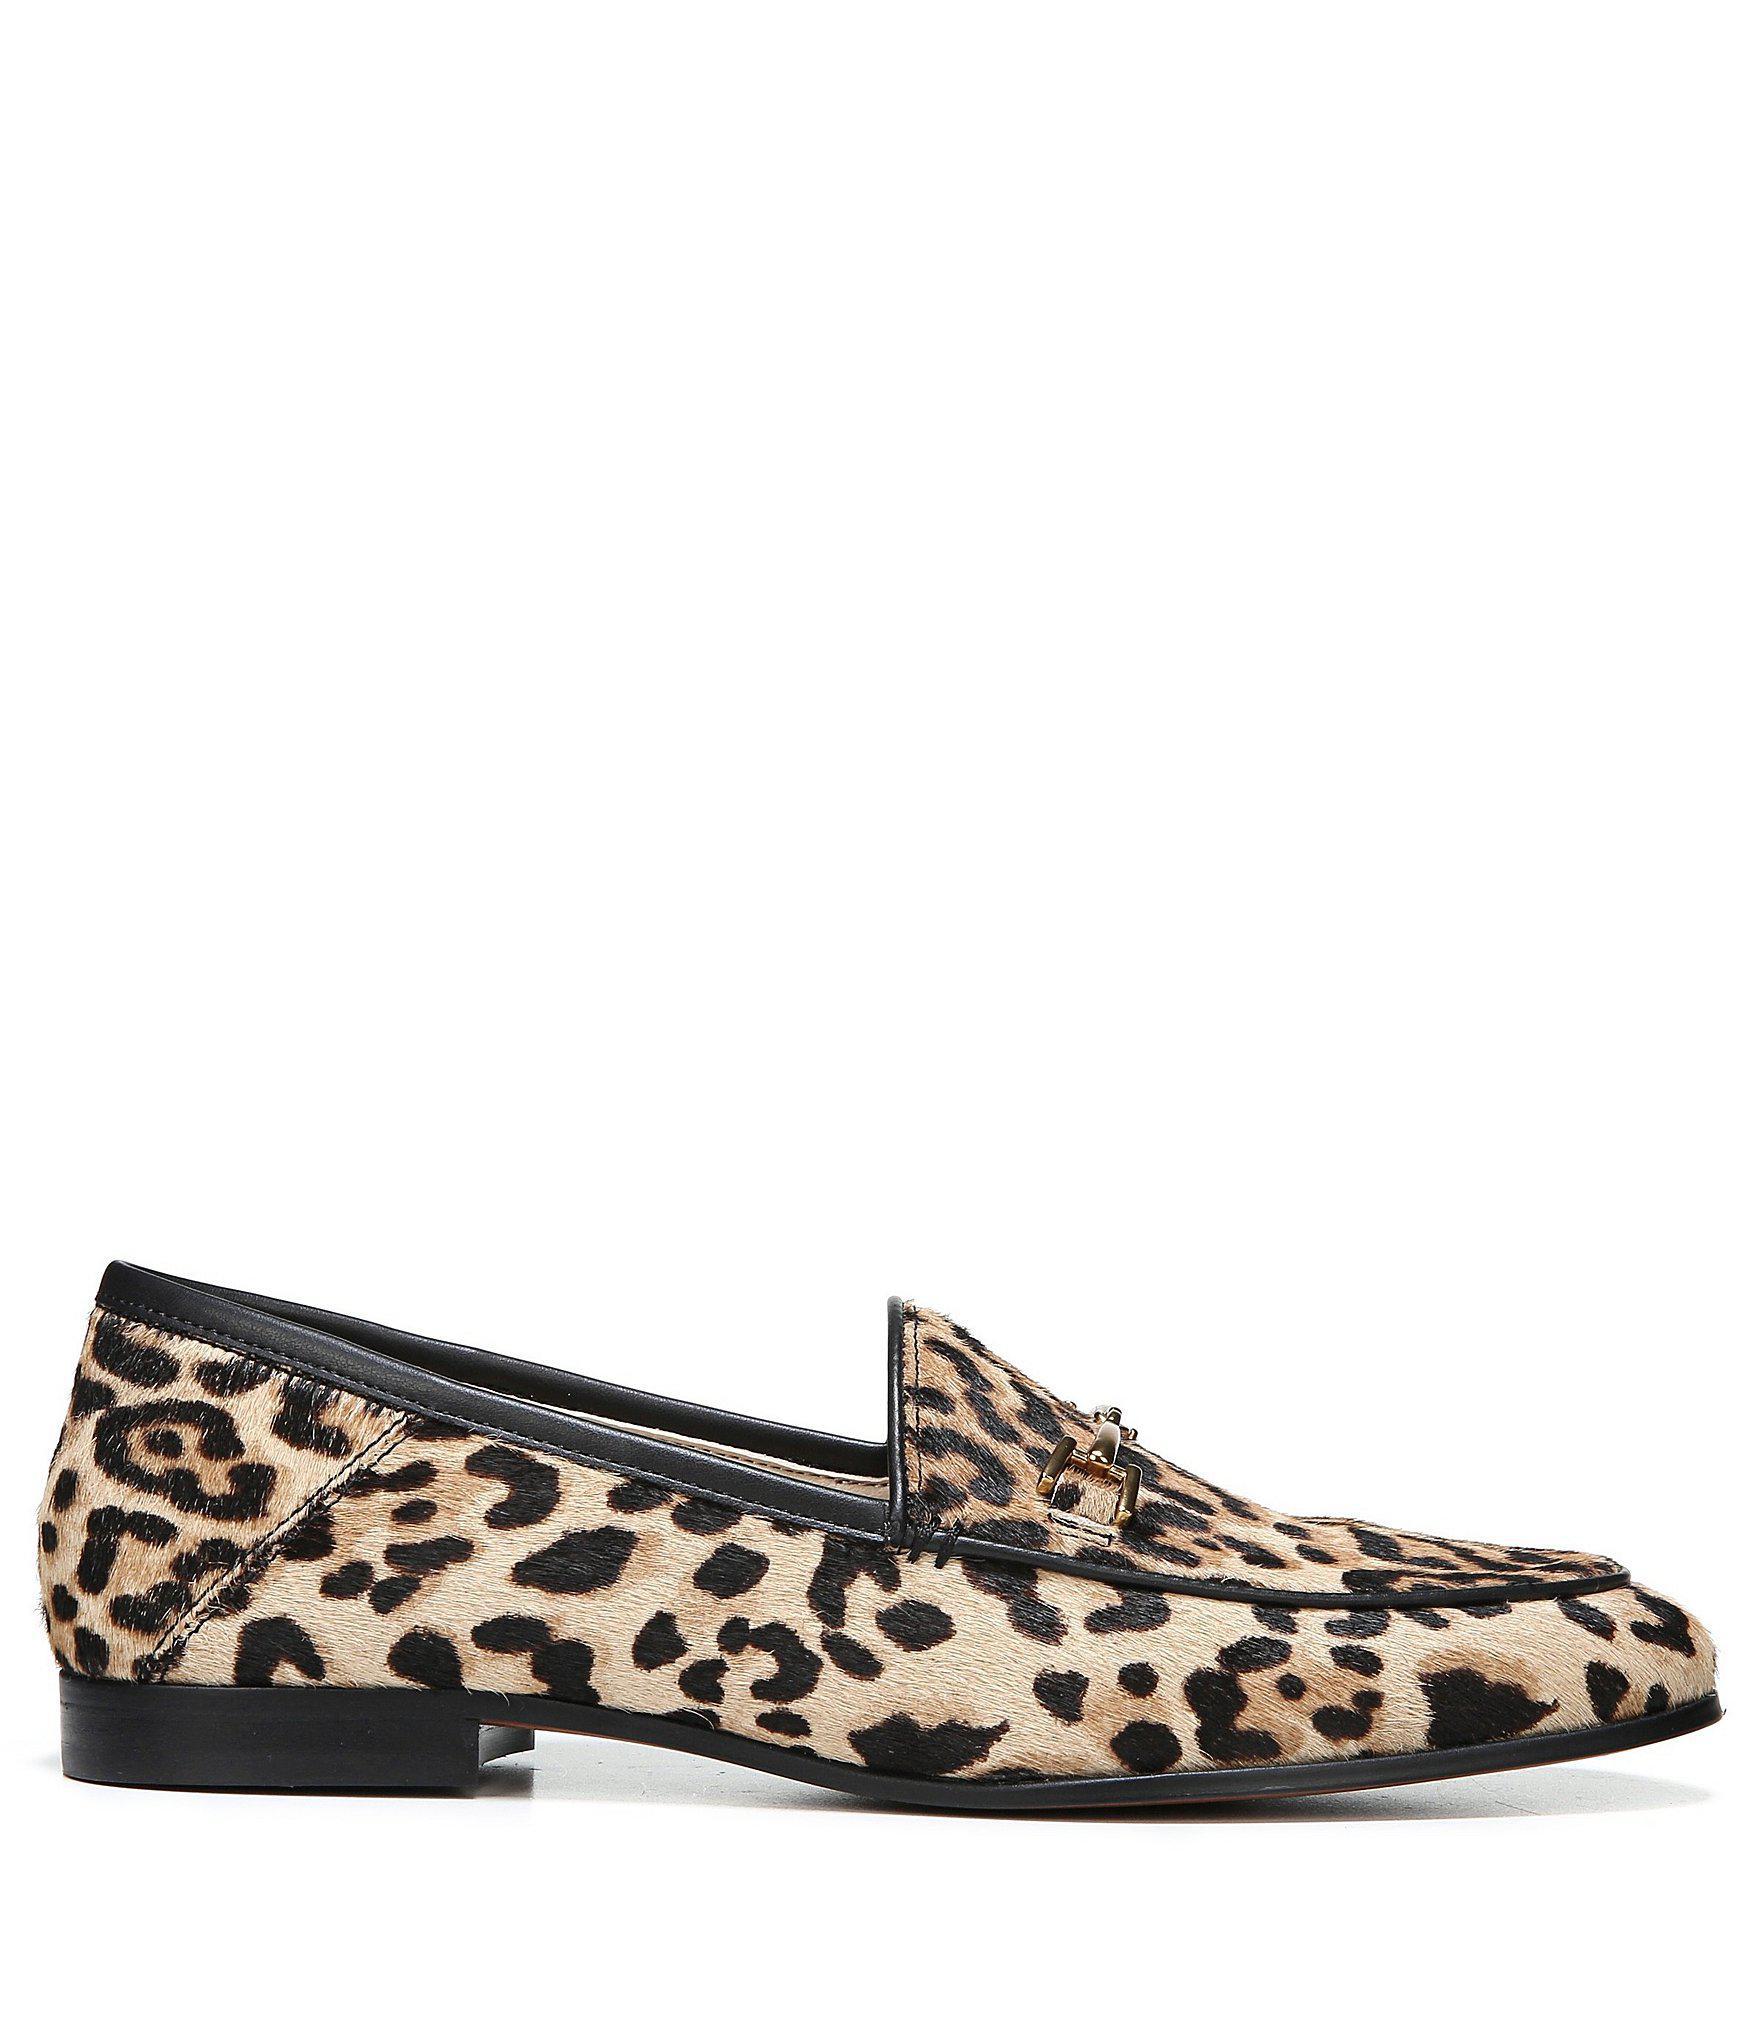 ae6369083d970 Sam Edelman - Brown Loraine Leopard Print Calf Hair Bit Embellishment Block  Heel Loafers - Lyst. View fullscreen